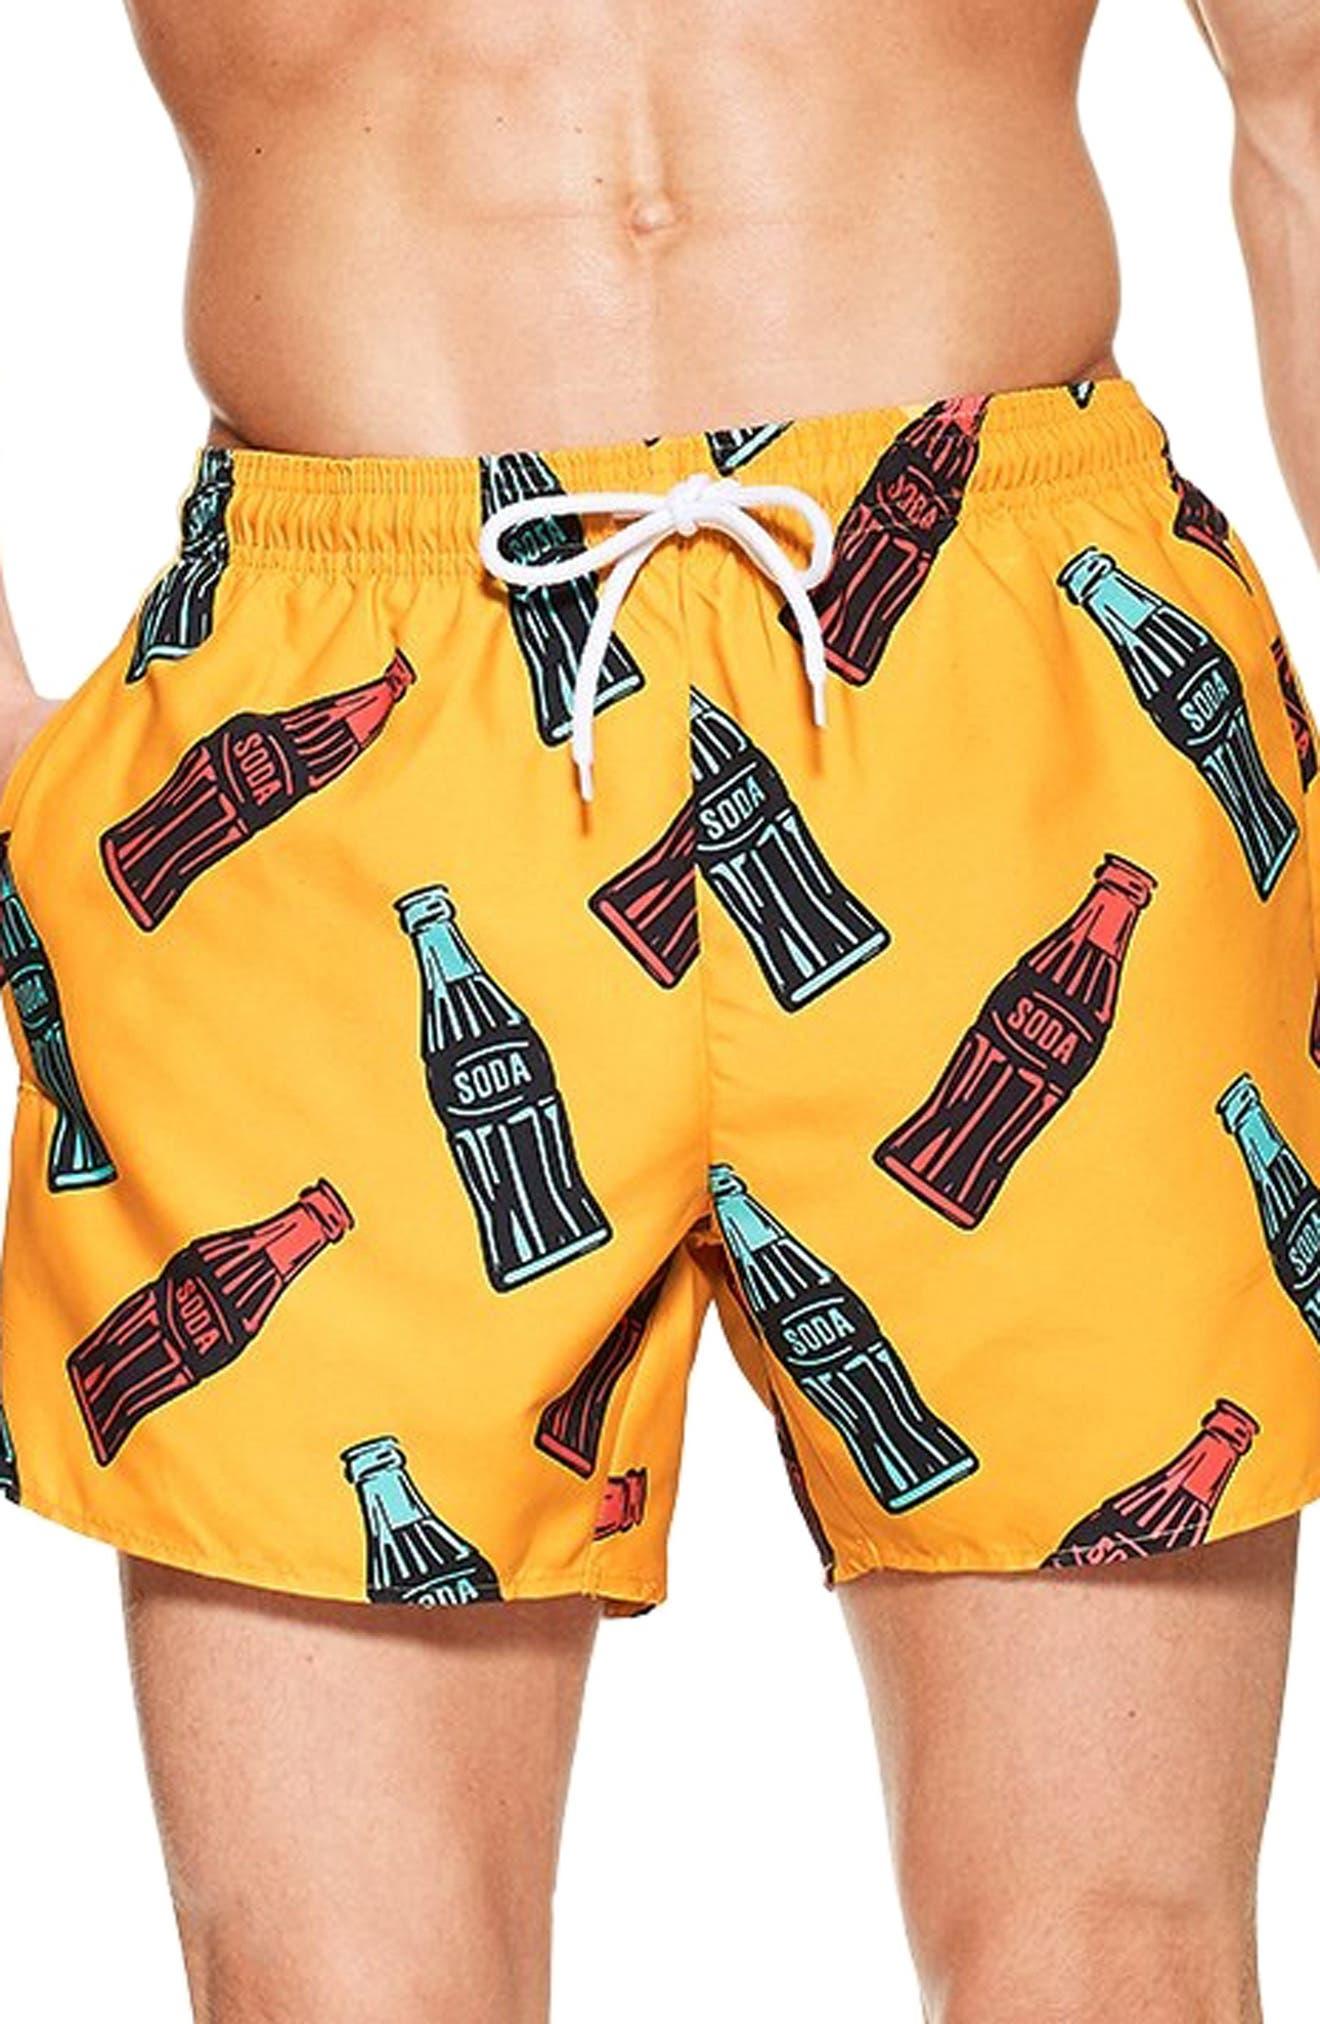 Topman Soda Bottle Swim Shorts, Orange